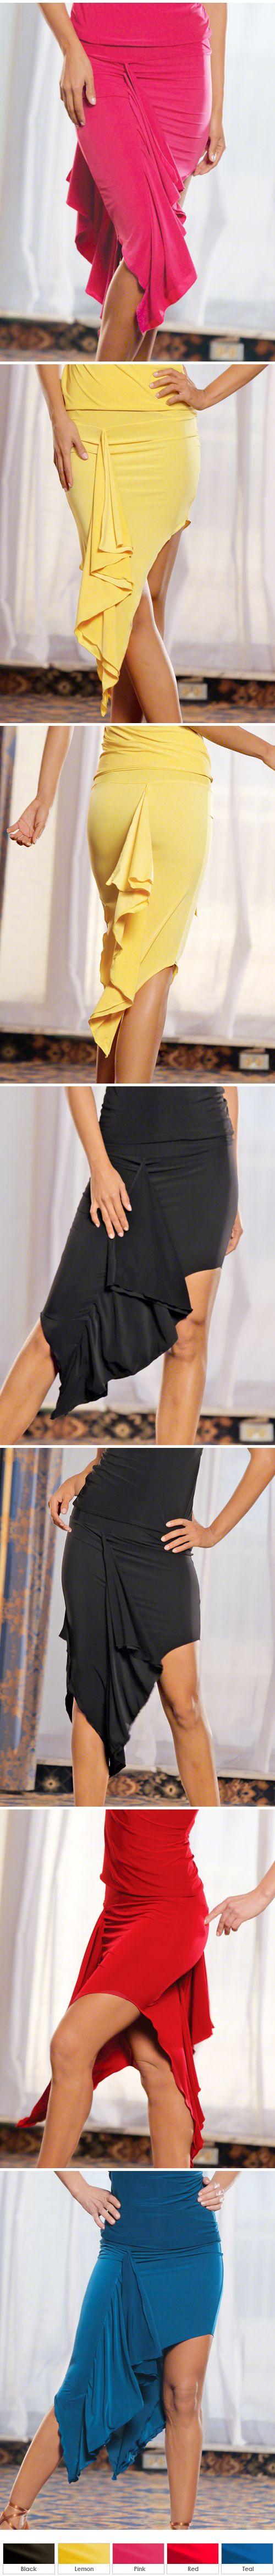 Dance America S312 - Flounced Pencil Latin Skirt  Love it!